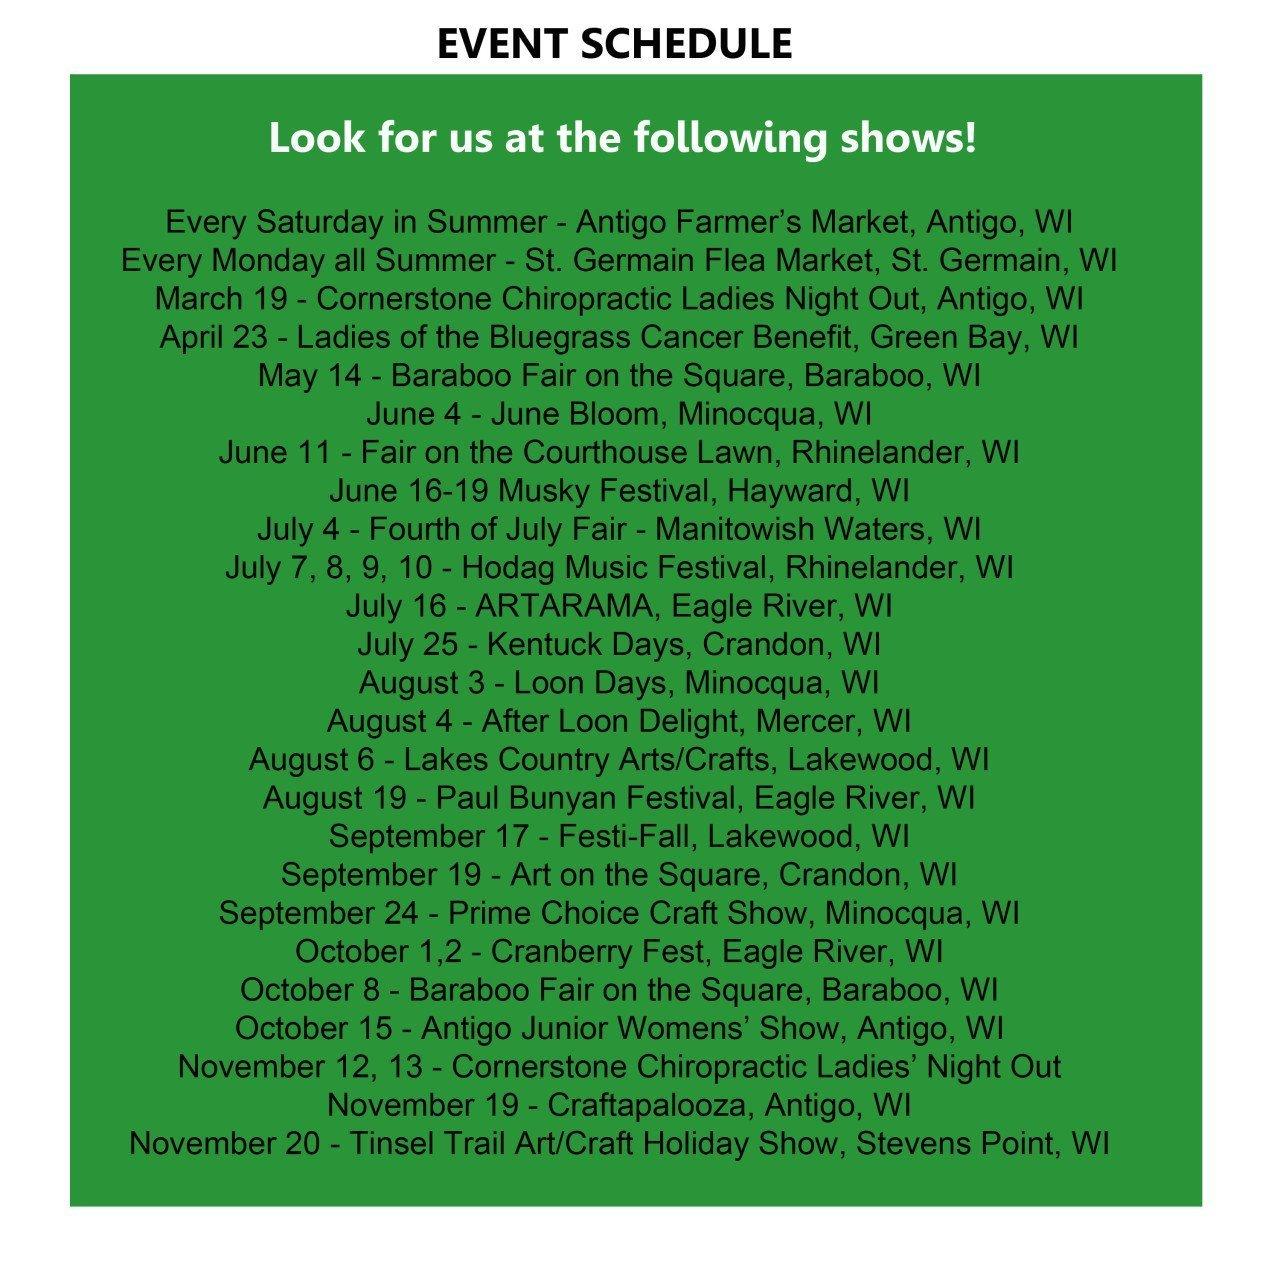 artsEnature 2016 Events & Show Schedule